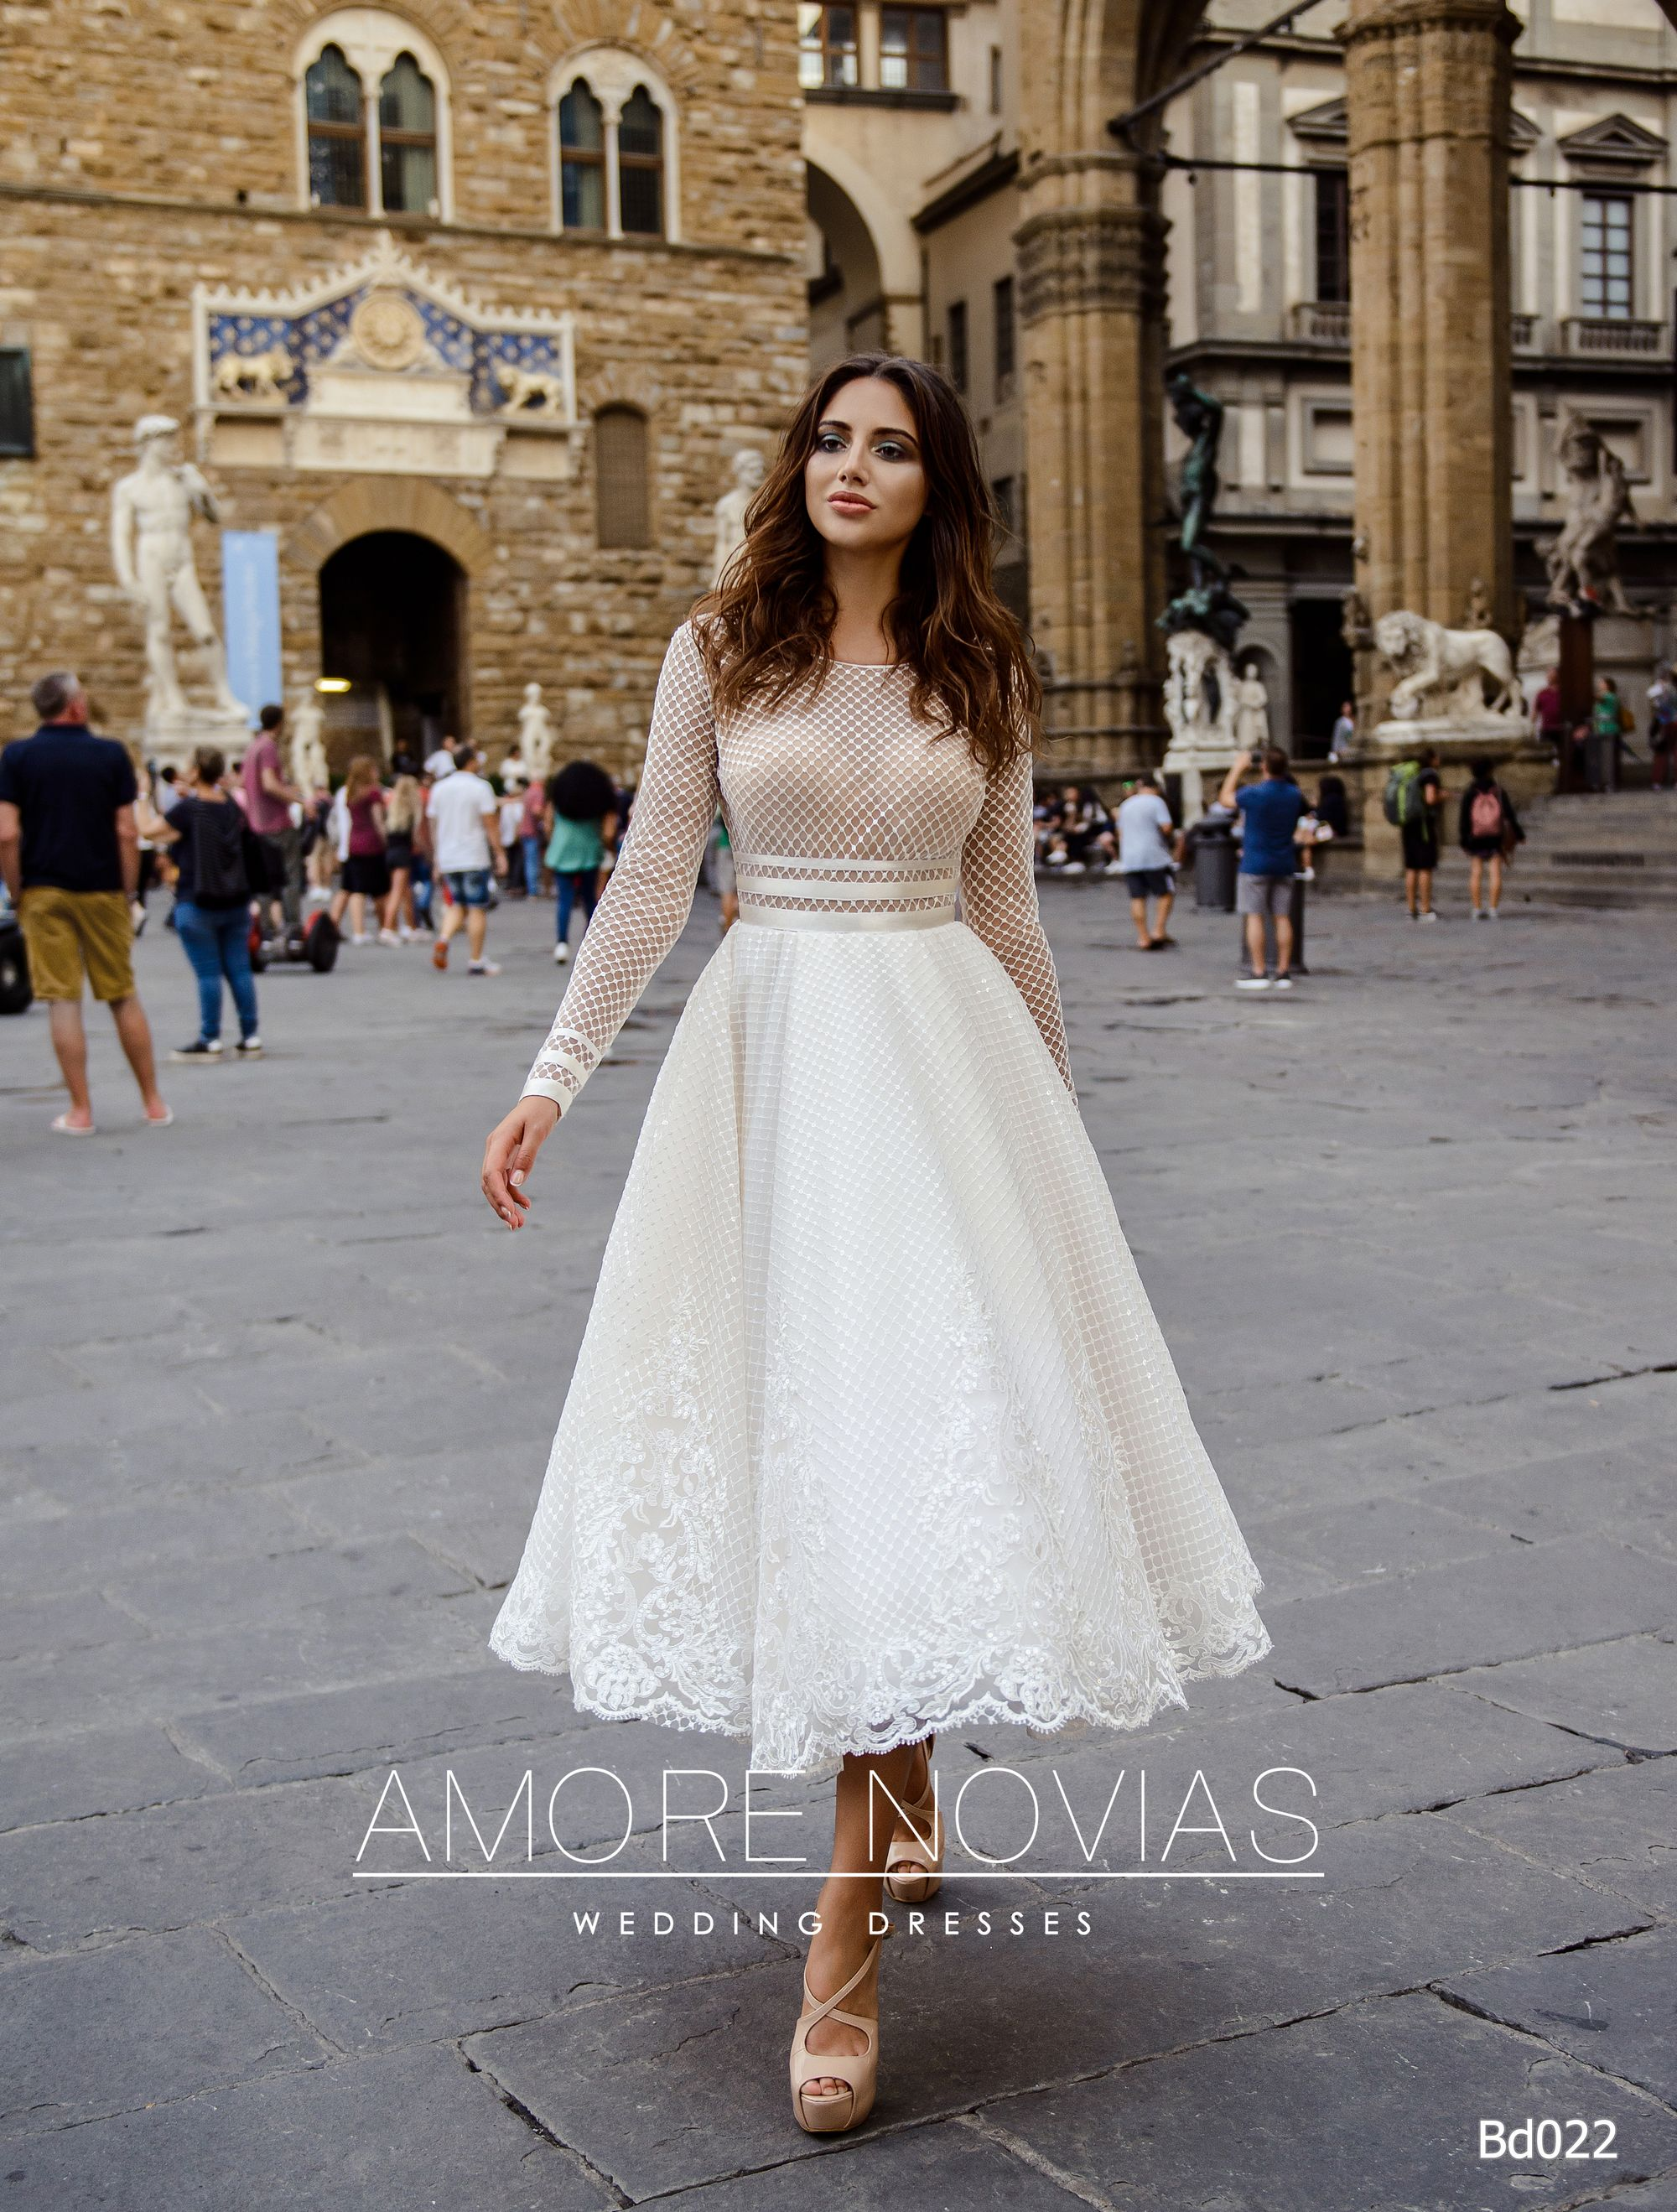 https://amore-novias.com/images/stories/virtuemart/product/bd022-------(1).jpg